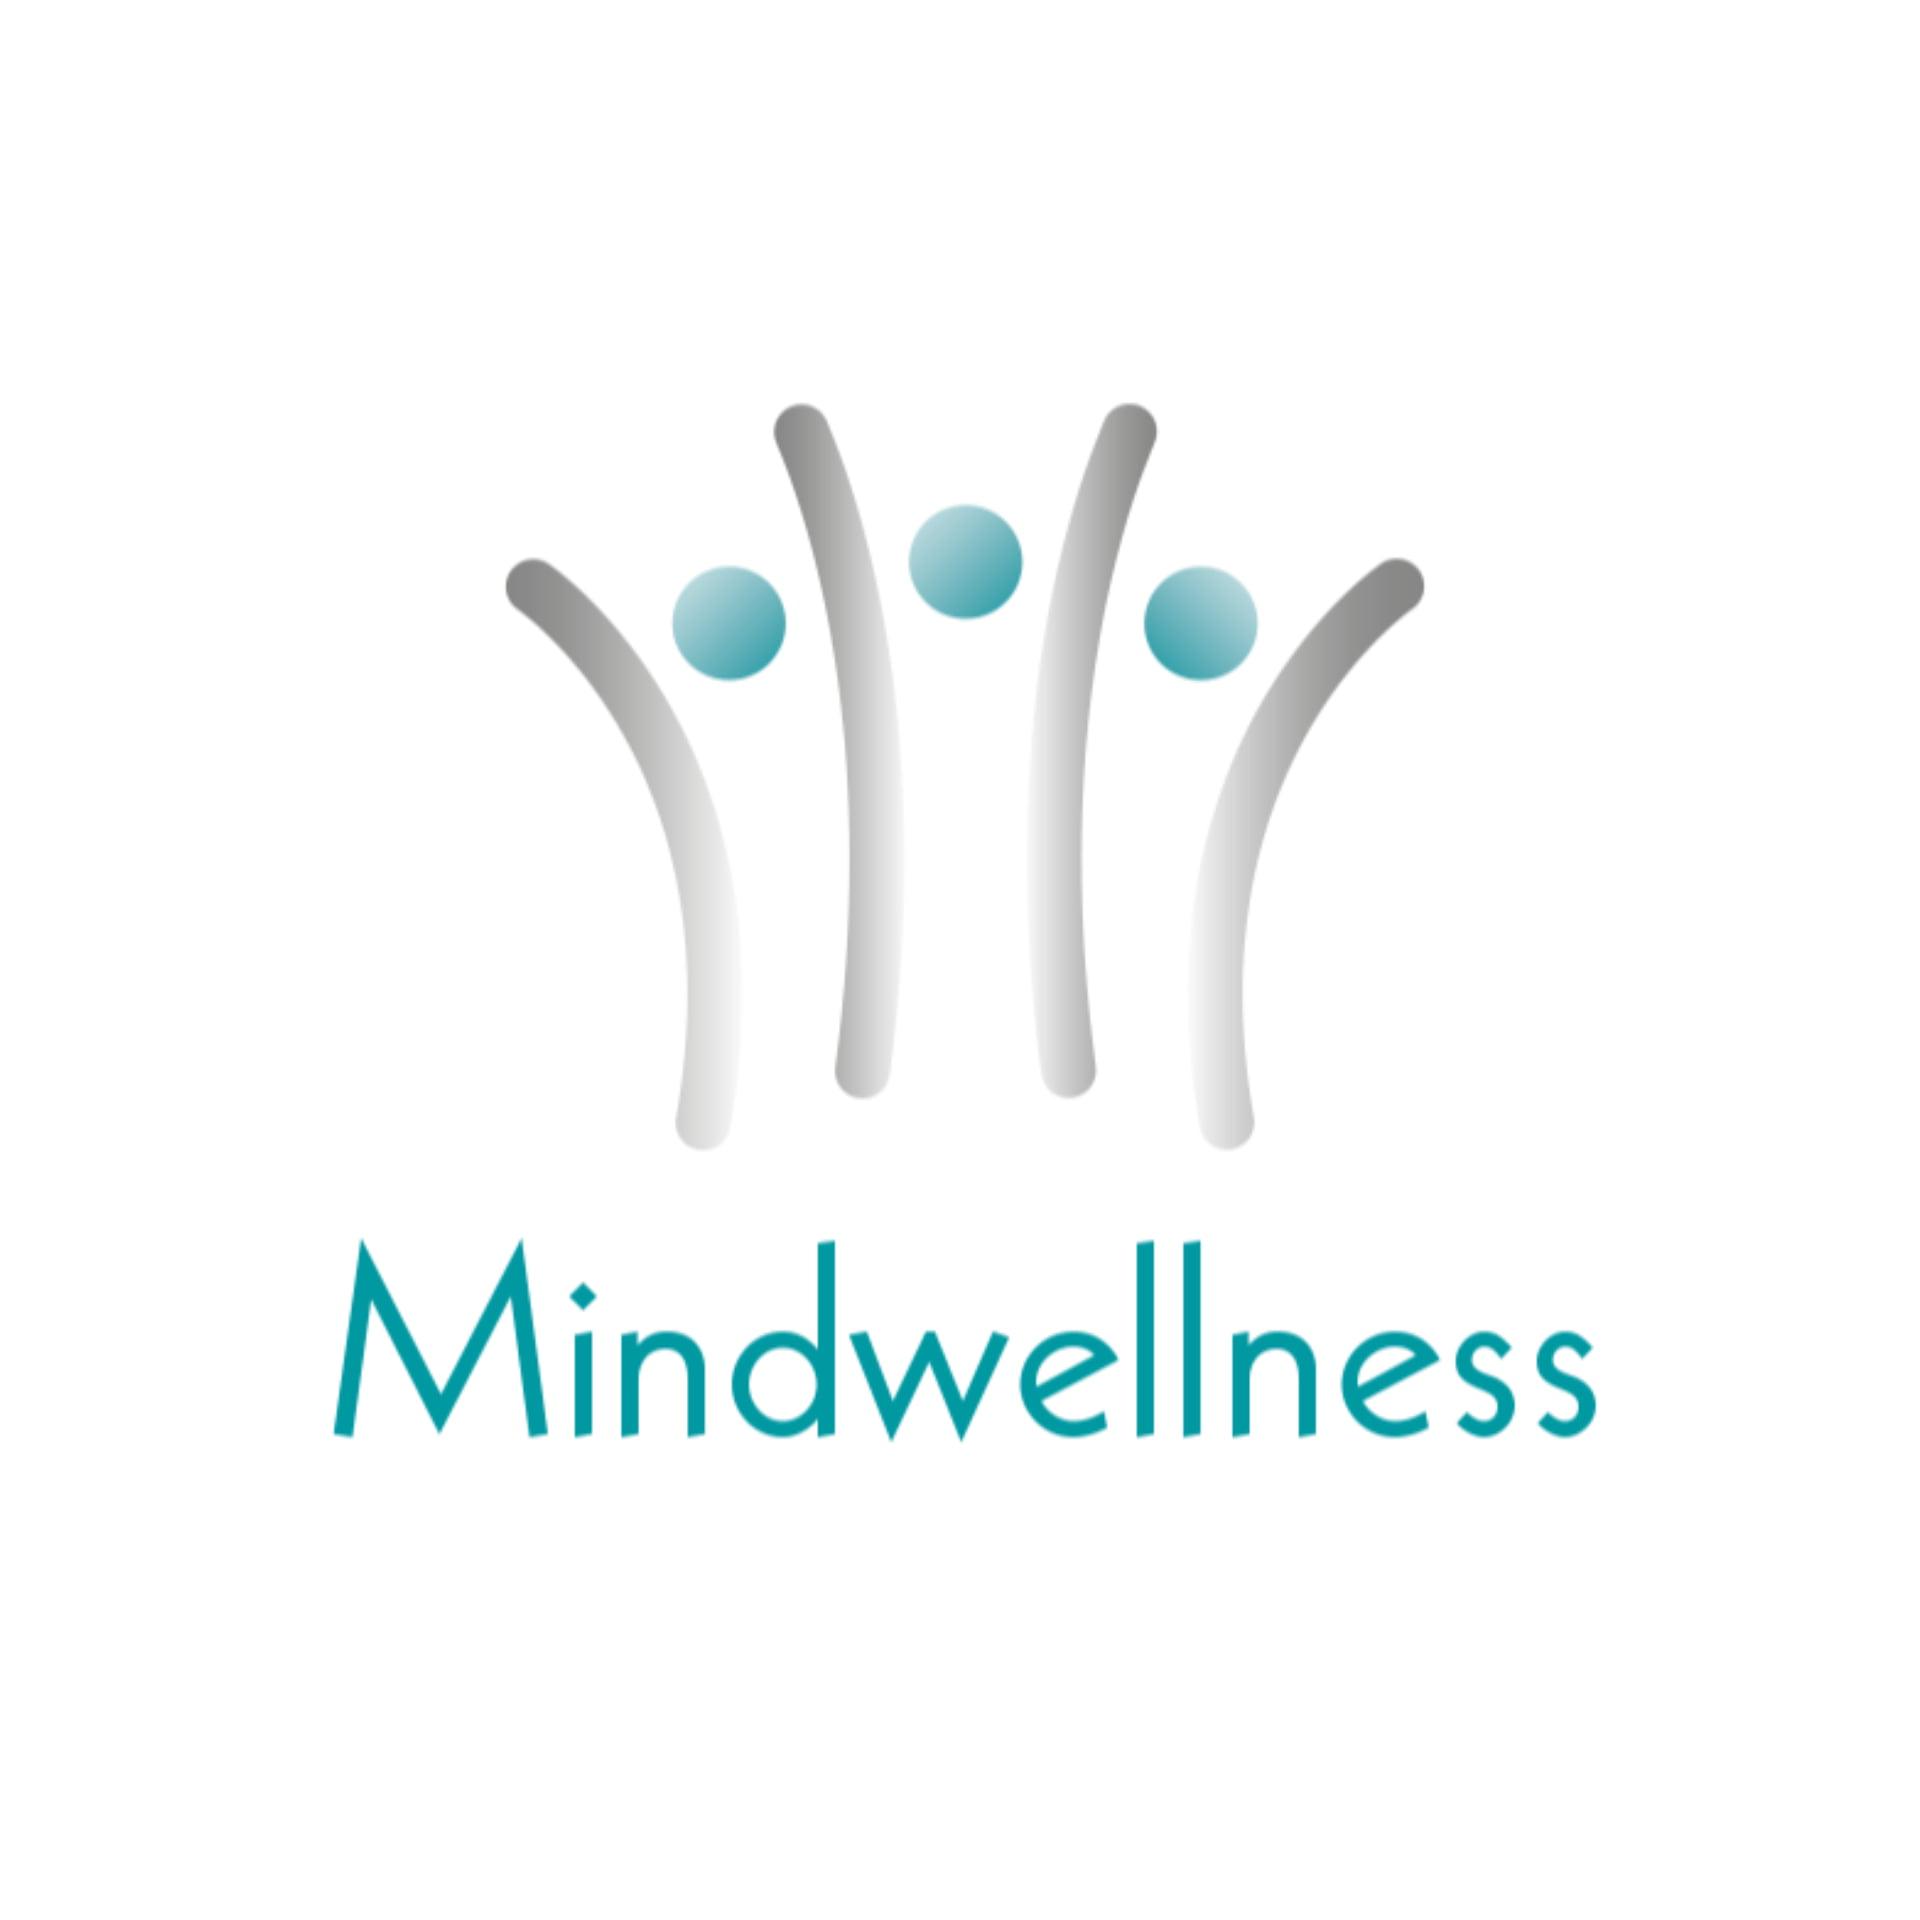 Mindwellness Violetta Braimovic